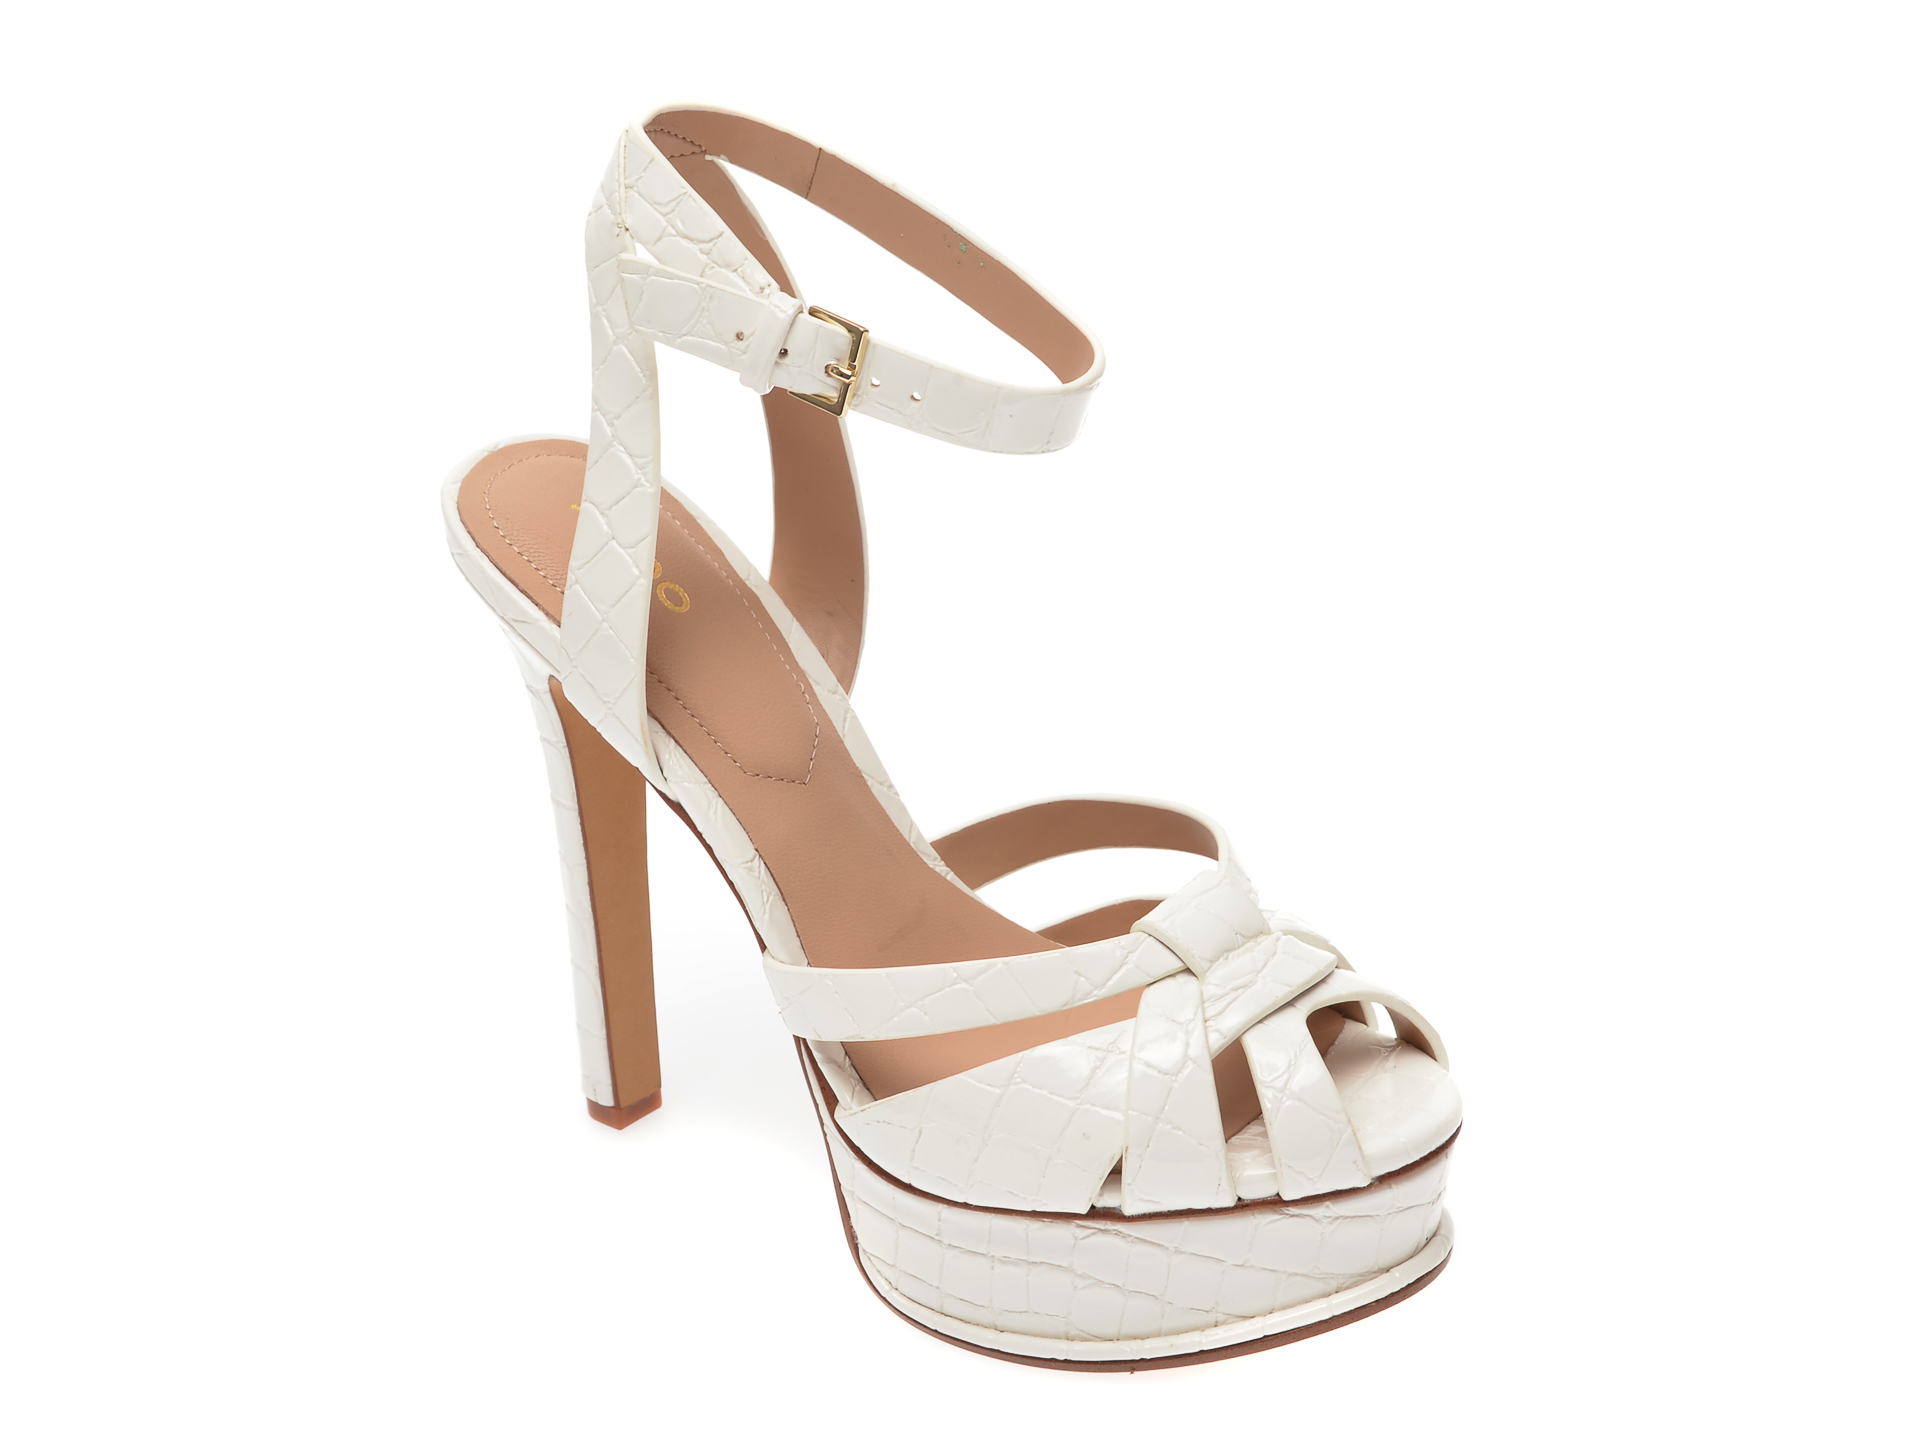 Sandale ALDO albe, Lacla110, din piele ecologica imagine otter.ro 2021